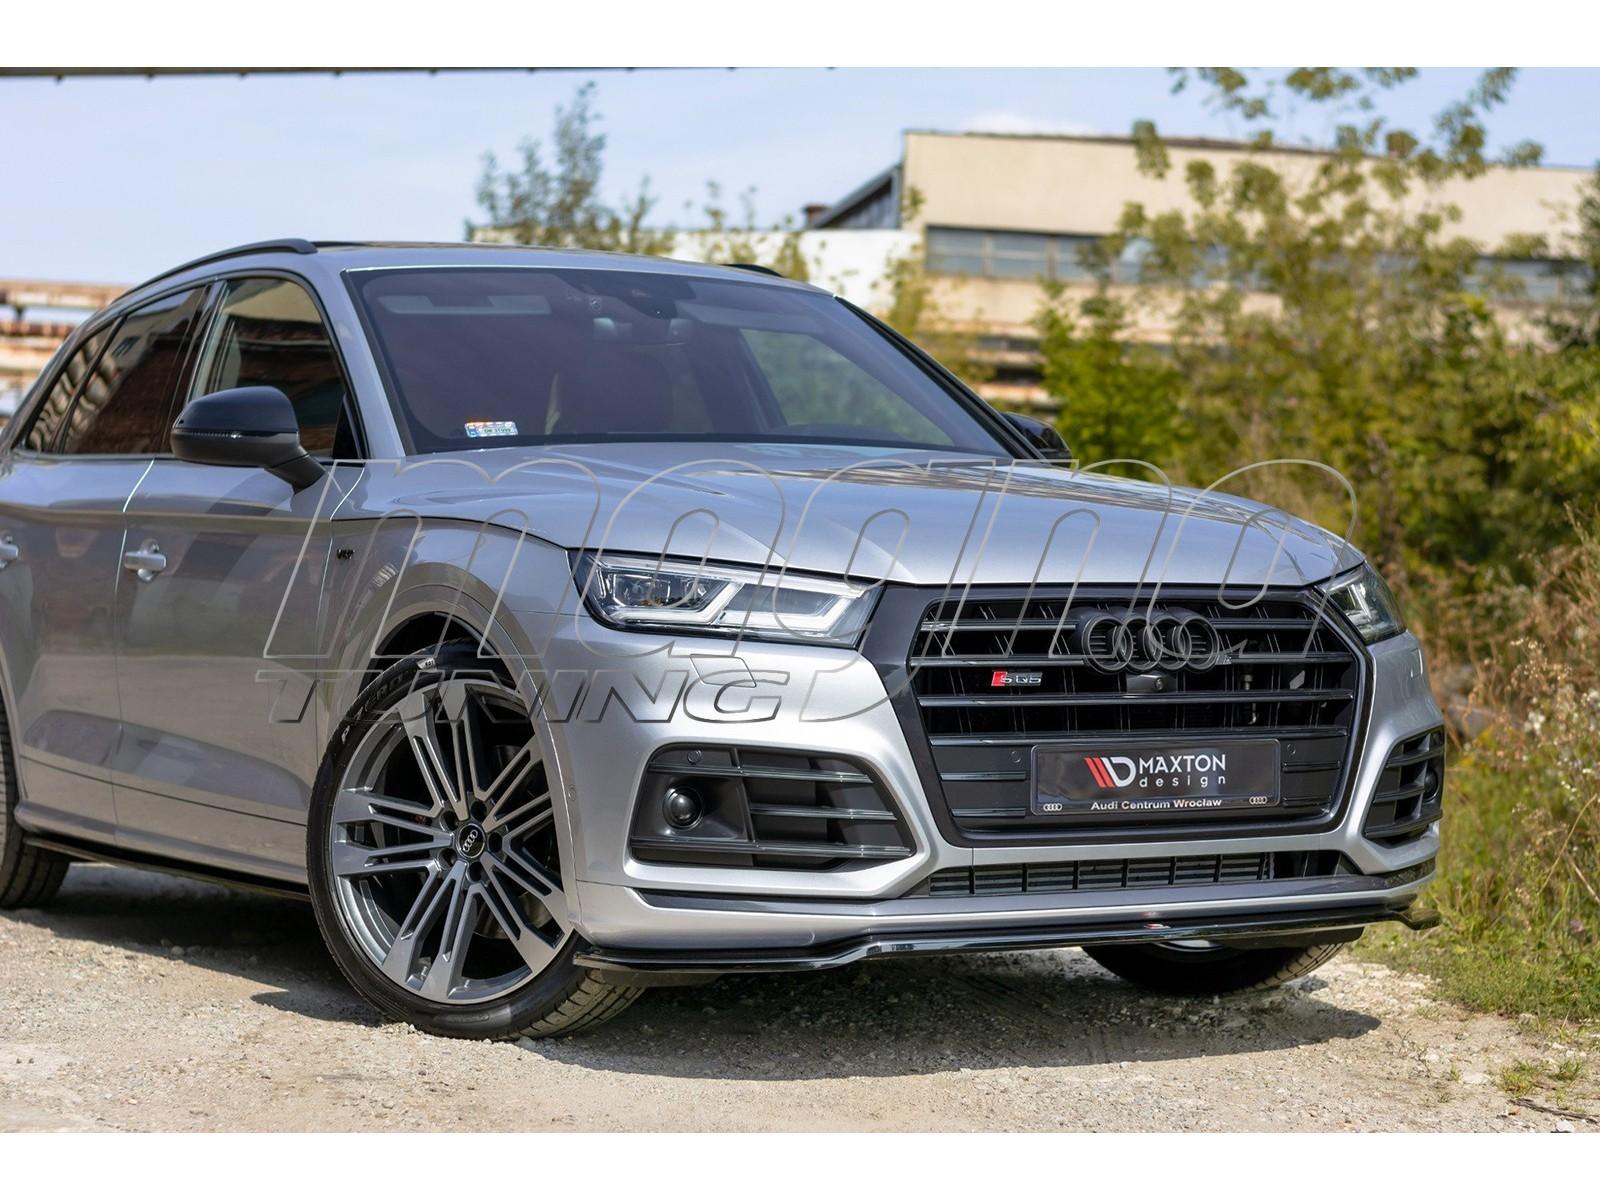 Audi Q5 FY MX Frontansatz